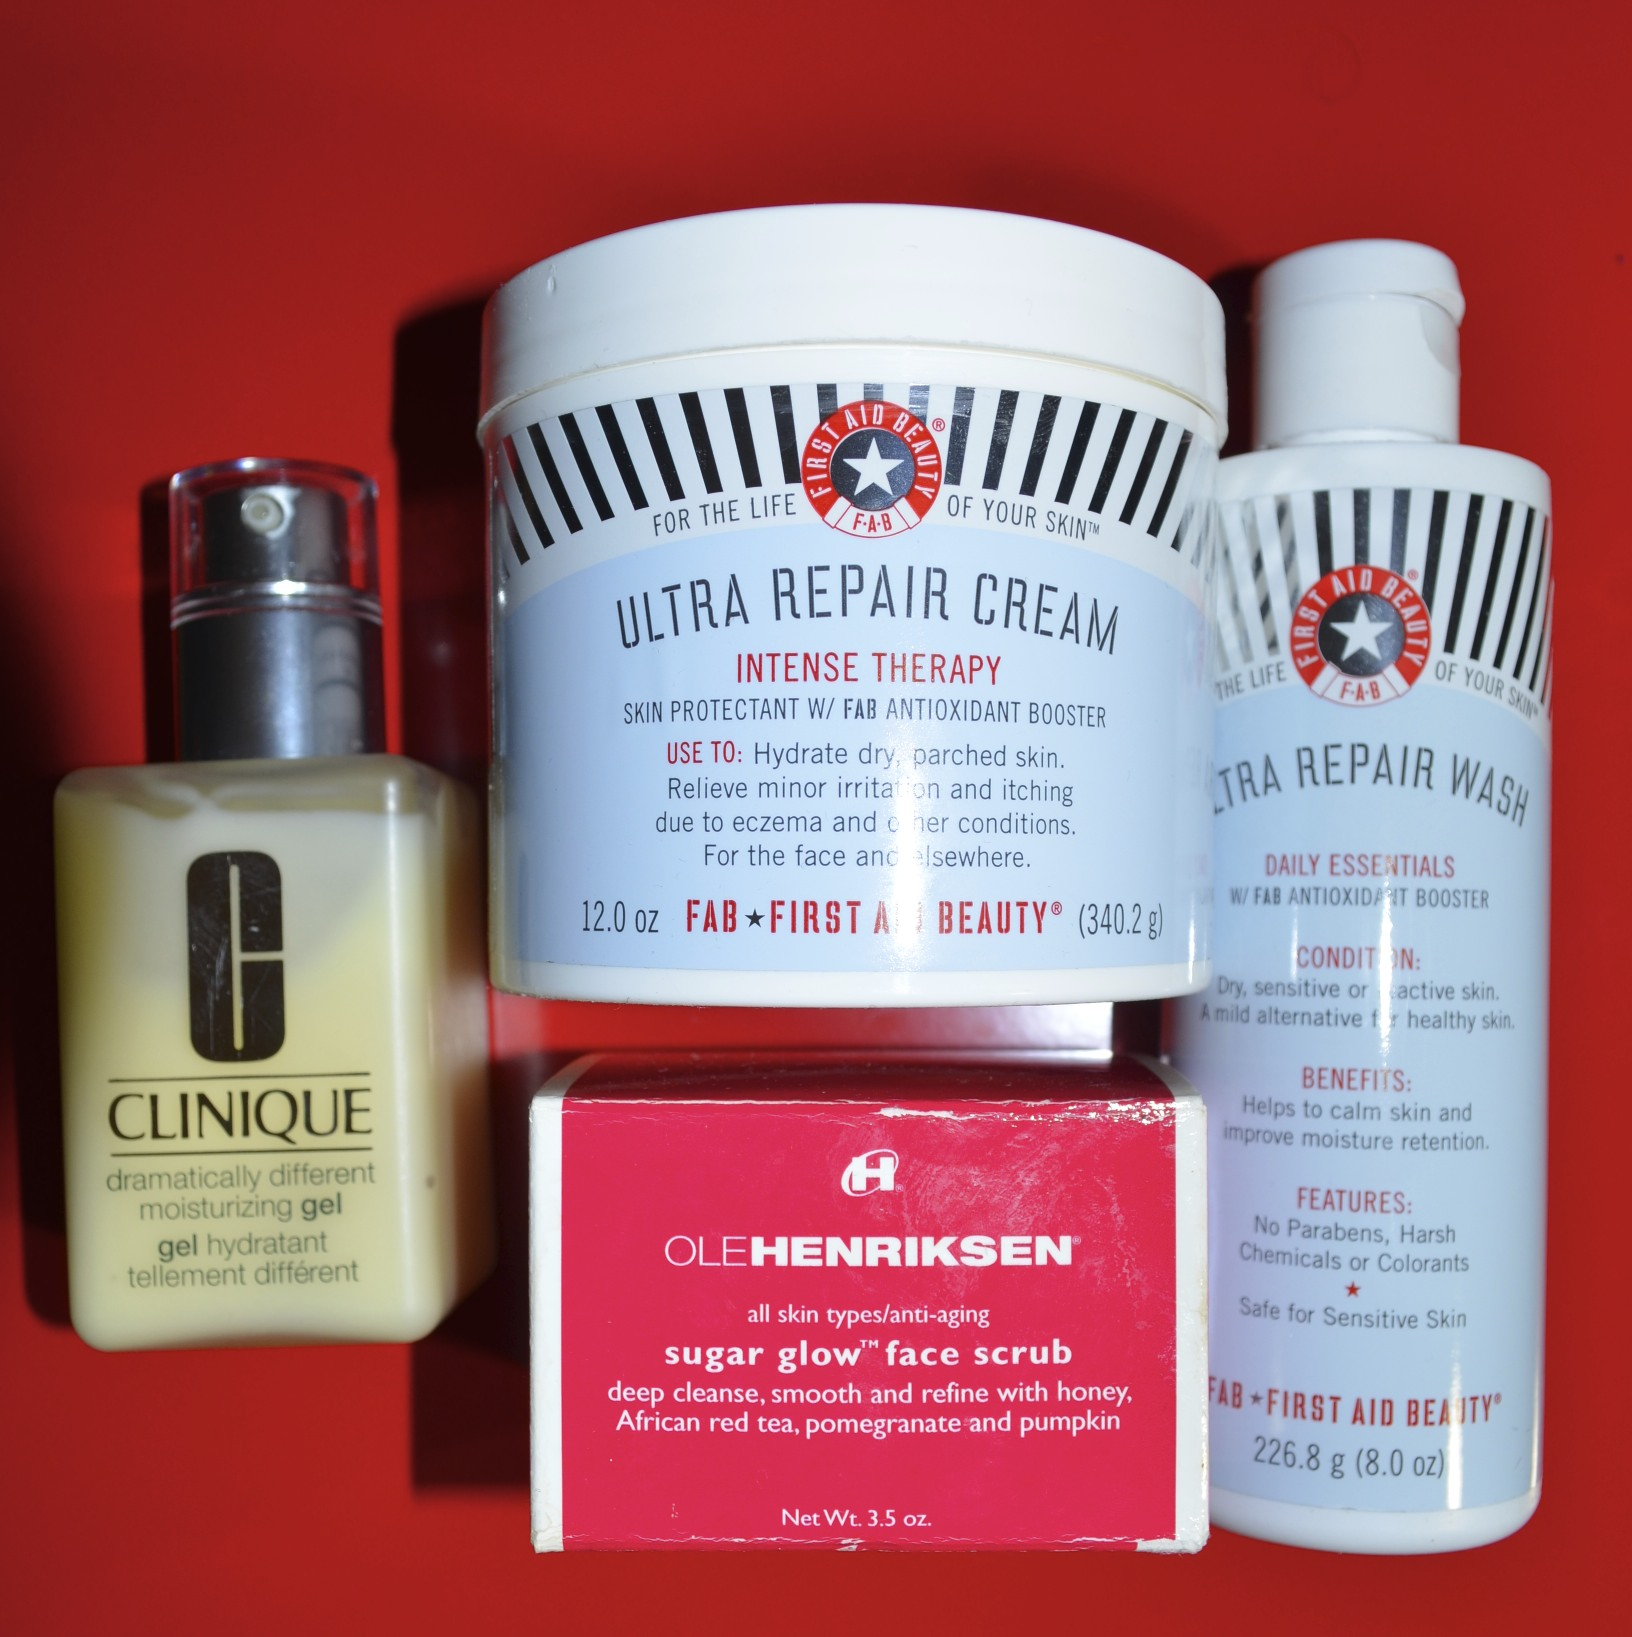 First Aid Beauty Ultra Repair Cream, First Aid Beauty Ultra Repair Cleanser, Ole Henriksen Sugar Glow Scrub, Clinique Dramatically Different Moisturizing Gel